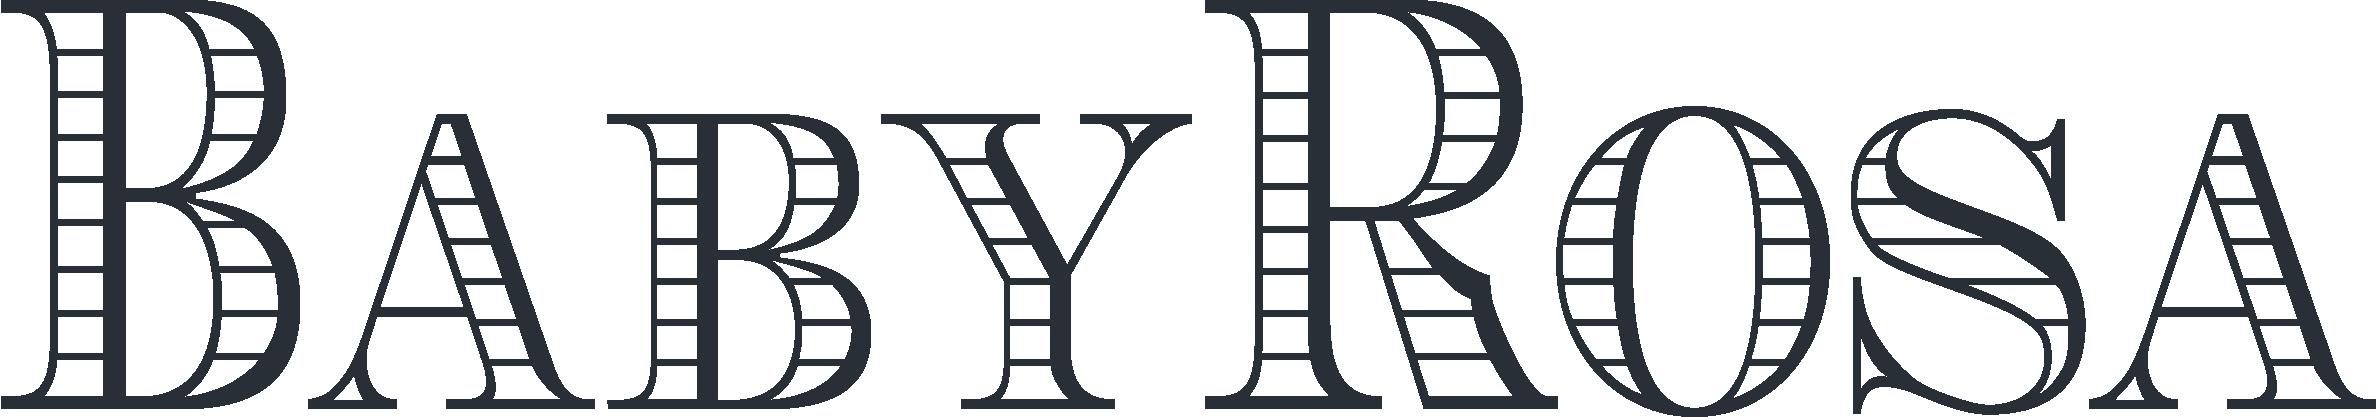 BabyRosa Abbigliamento Logo